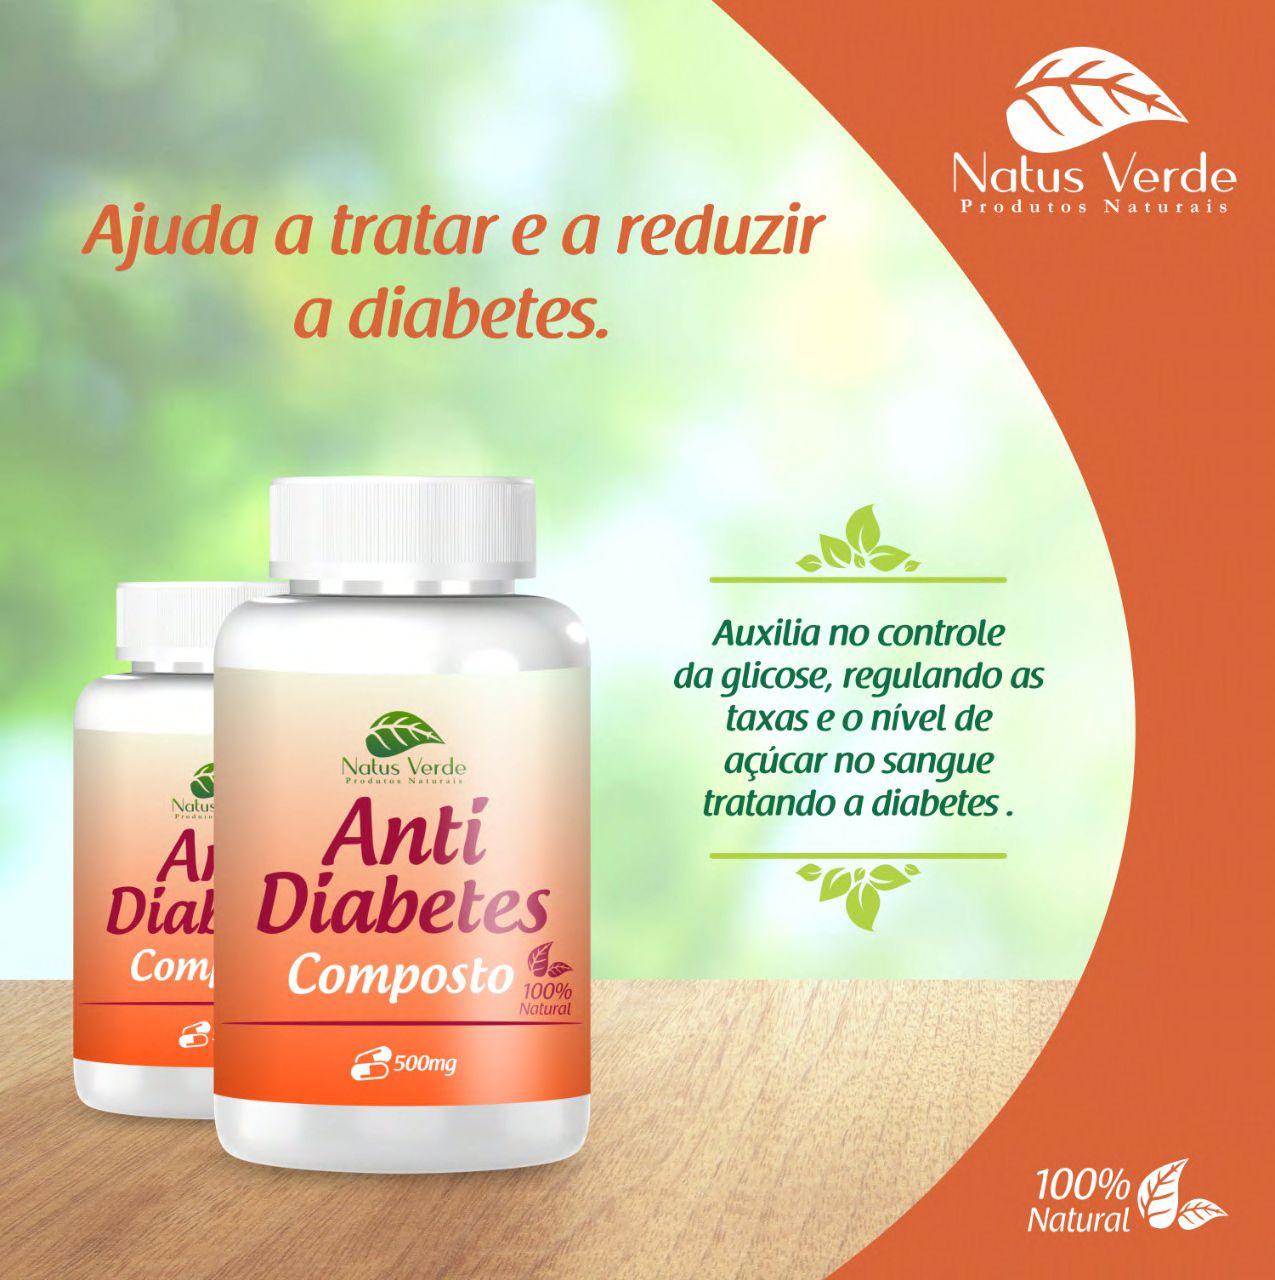 Composto Natural Anti Diabetes Natus Verde 60 caps  - Fribasex - Fabricasex.com